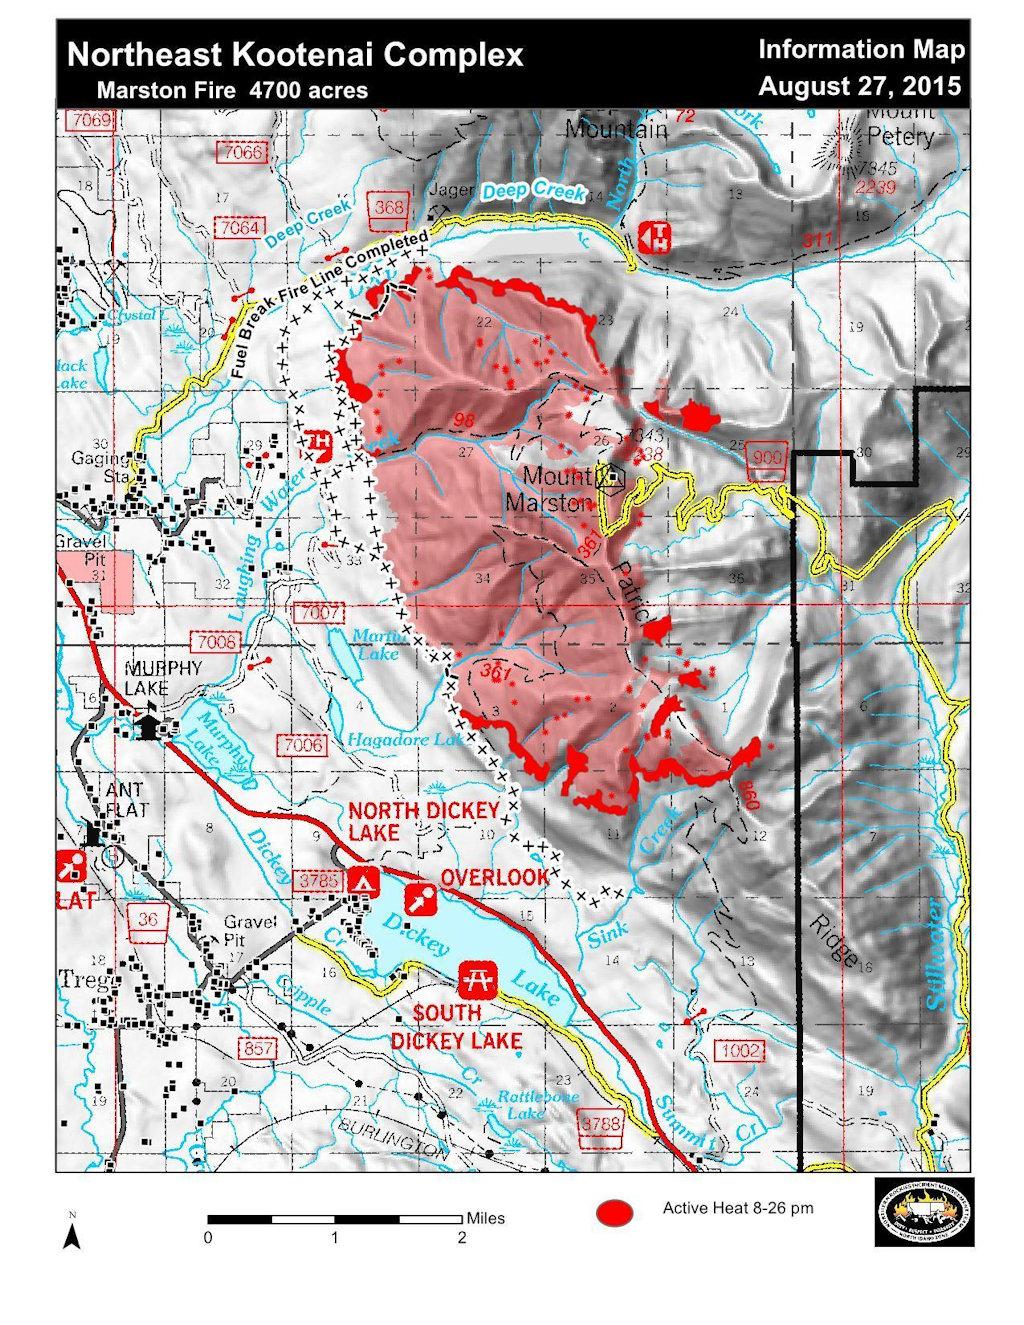 Marston Fire Map-Aug 27, 2015